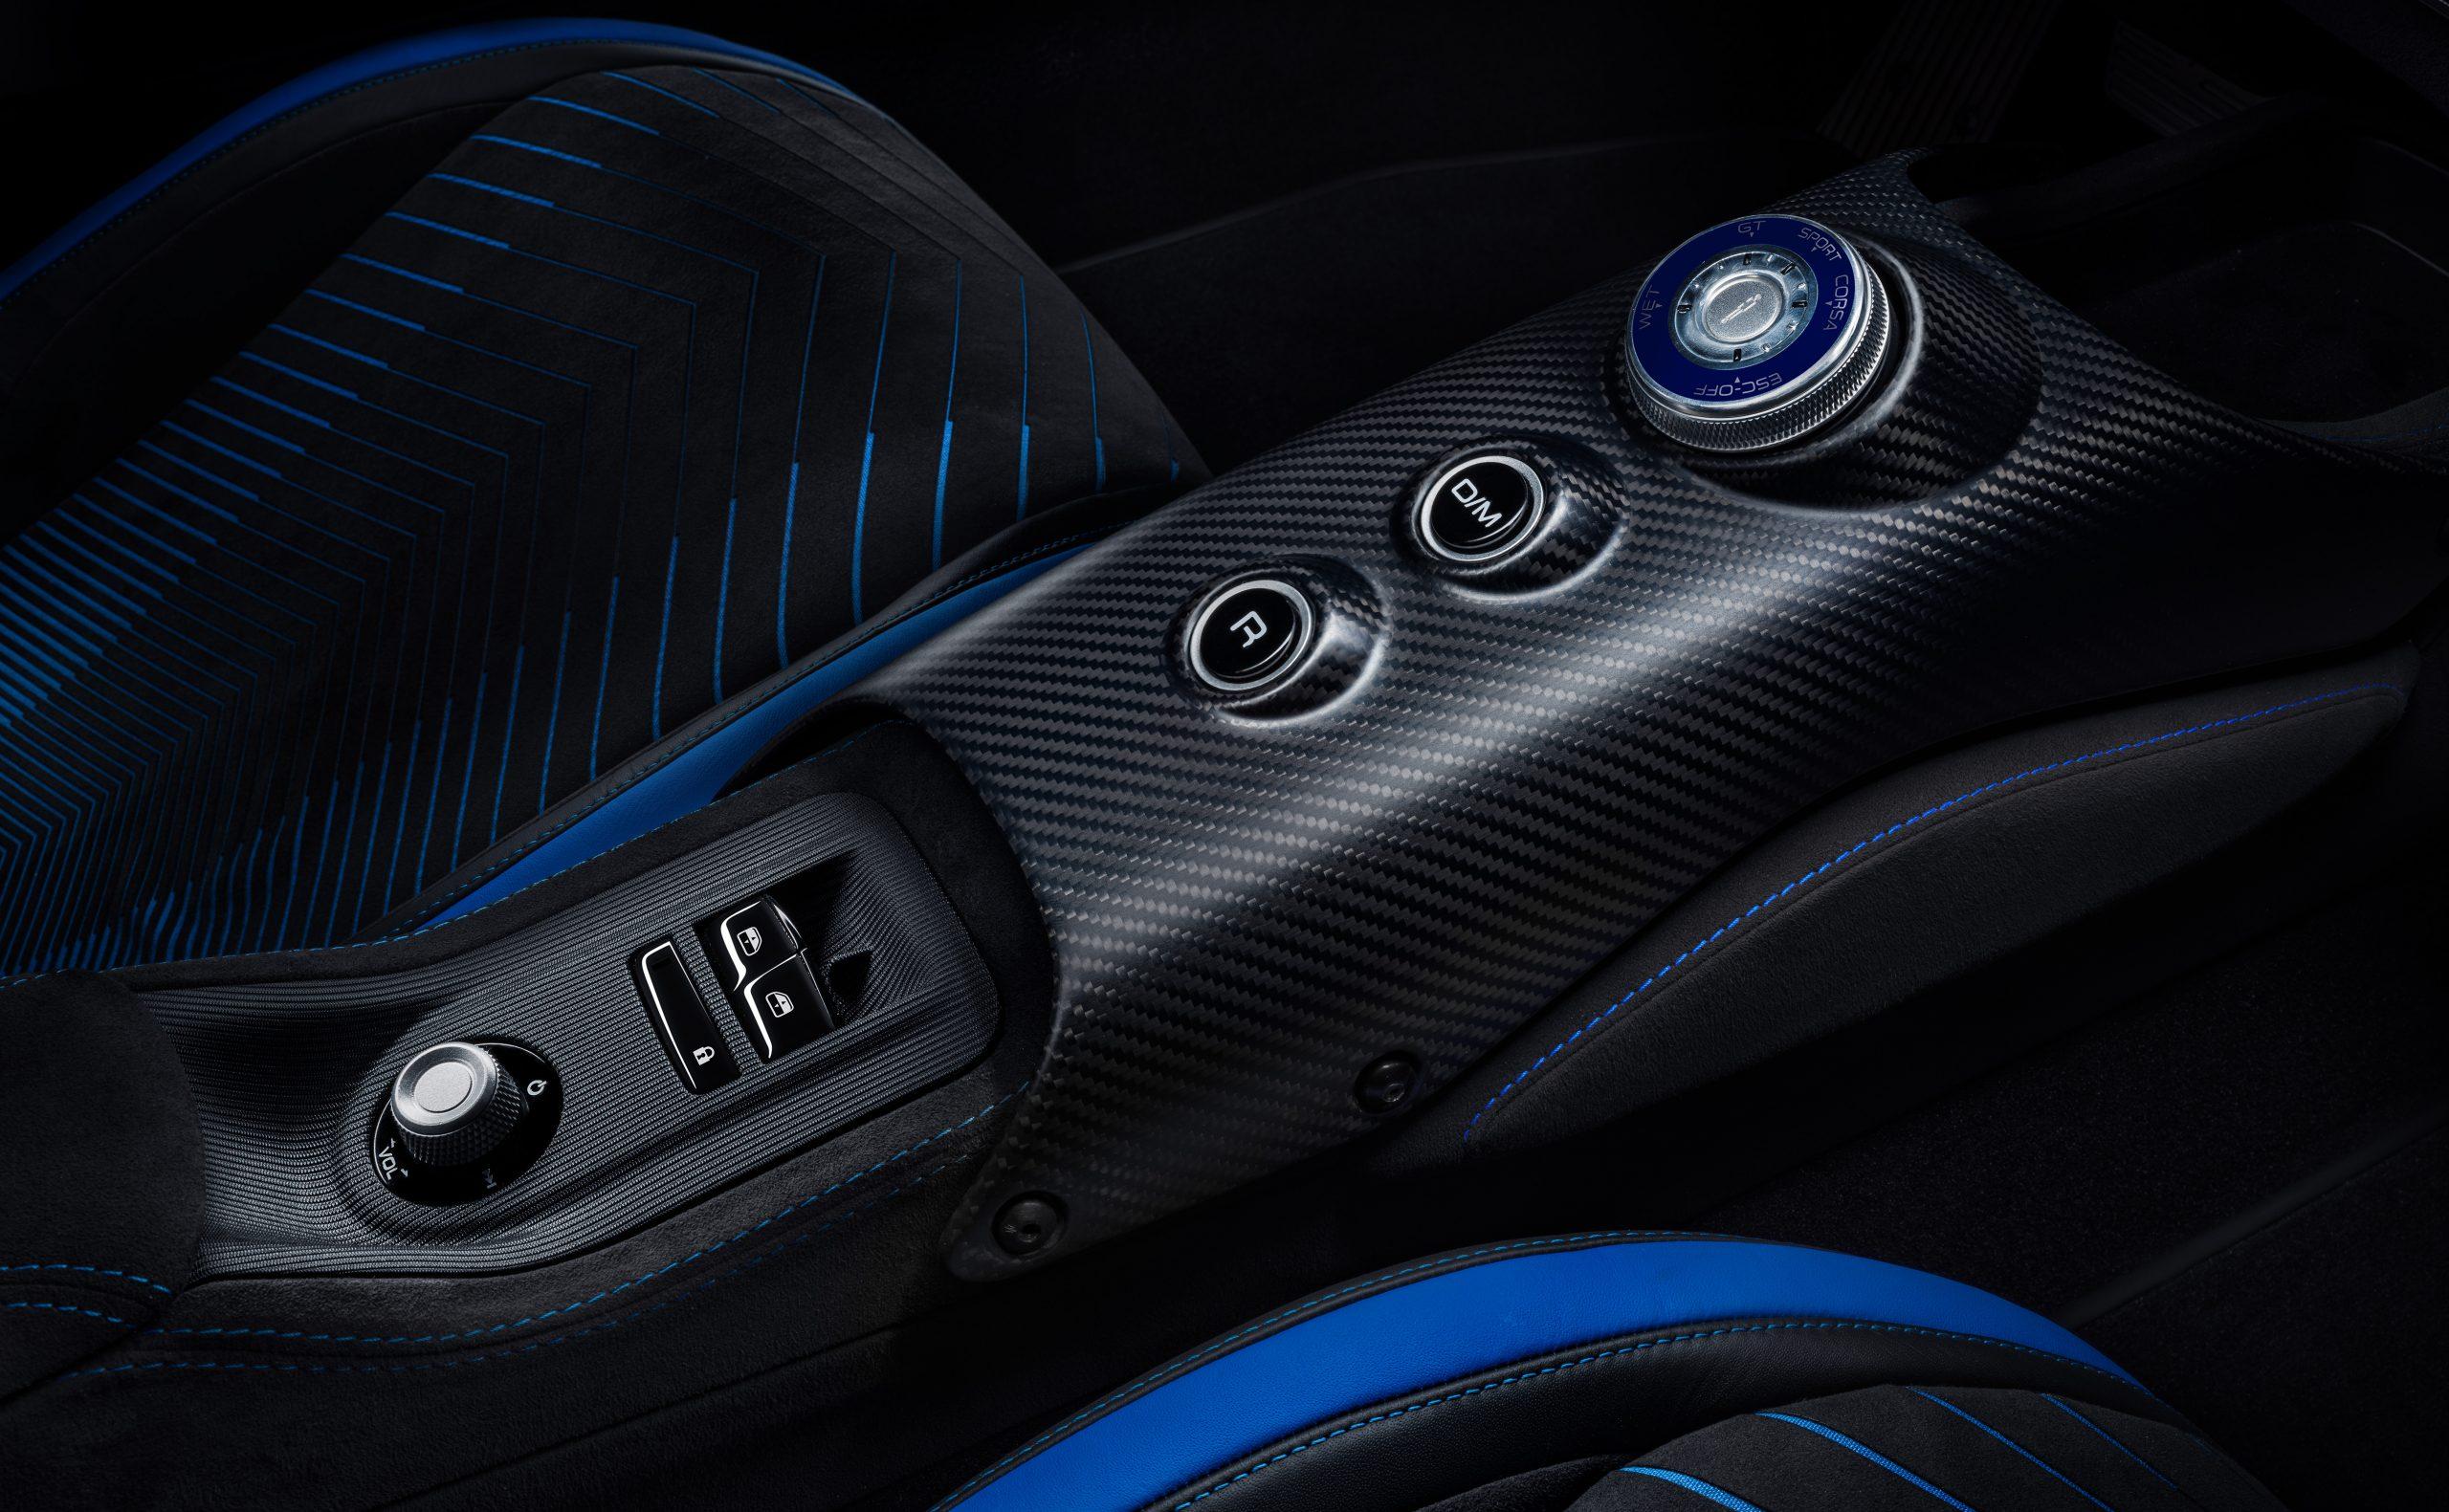 Maserati MC20 interior buttons control carbon-fiber